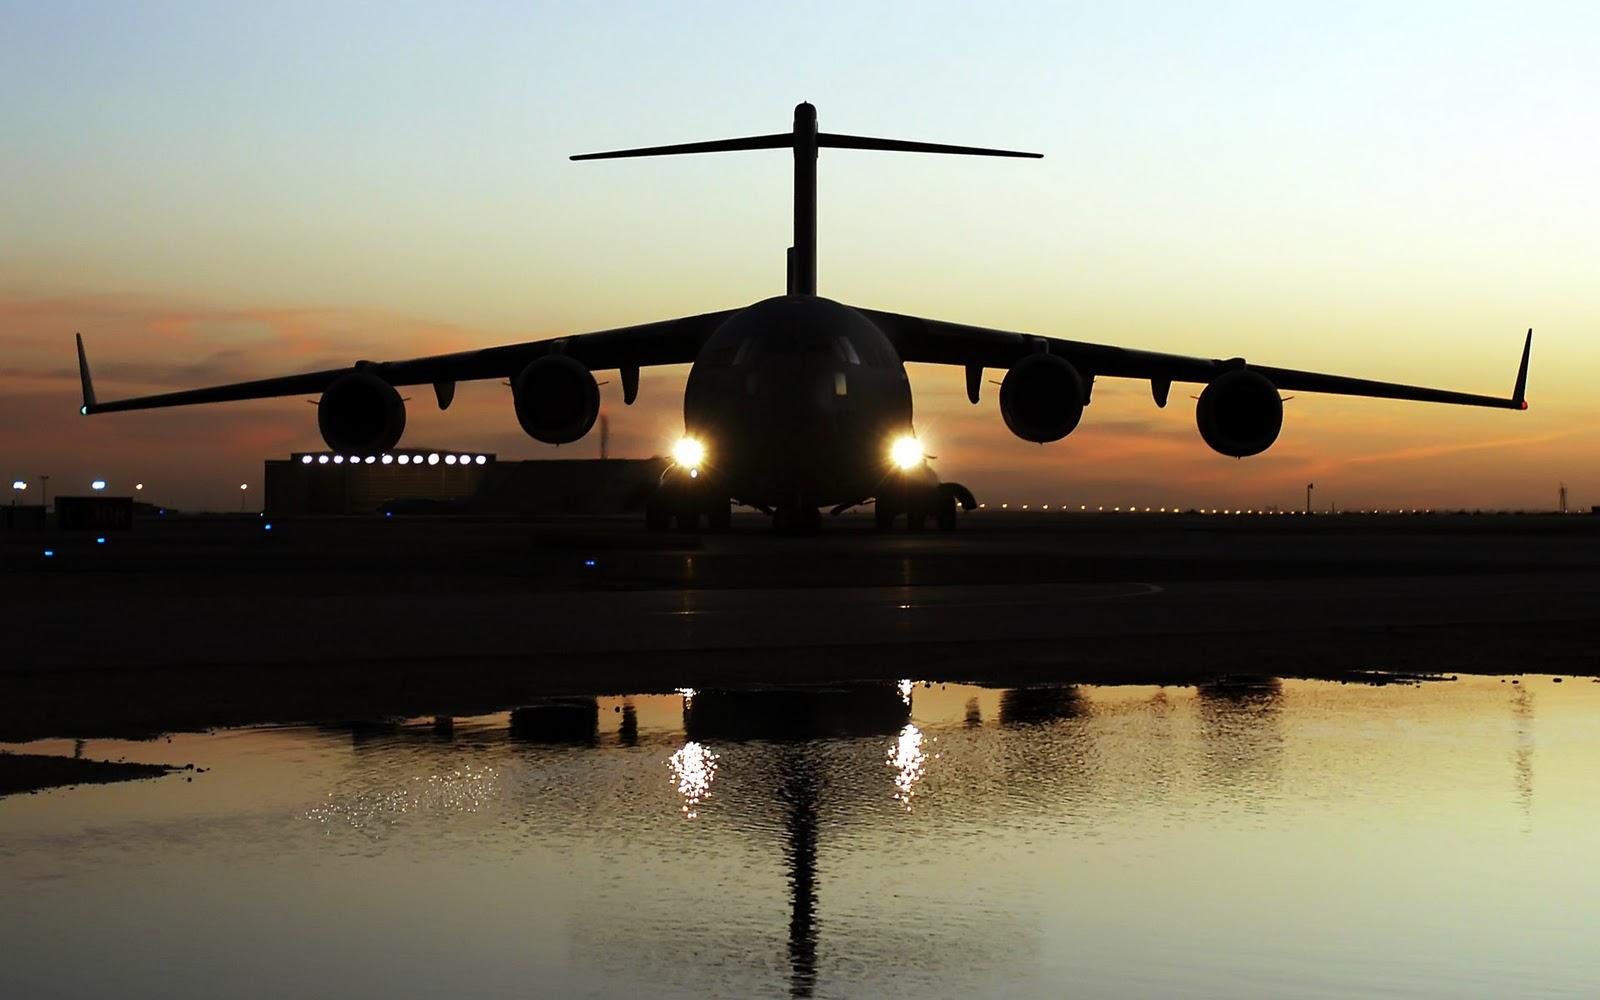 http://1.bp.blogspot.com/_KtoUah5Q8Zc/TONn8T2U-GI/AAAAAAAAAEs/Z1mfa7PMwoY/s1600/c_17_globemaster_iii_aircraft-wide.jpg